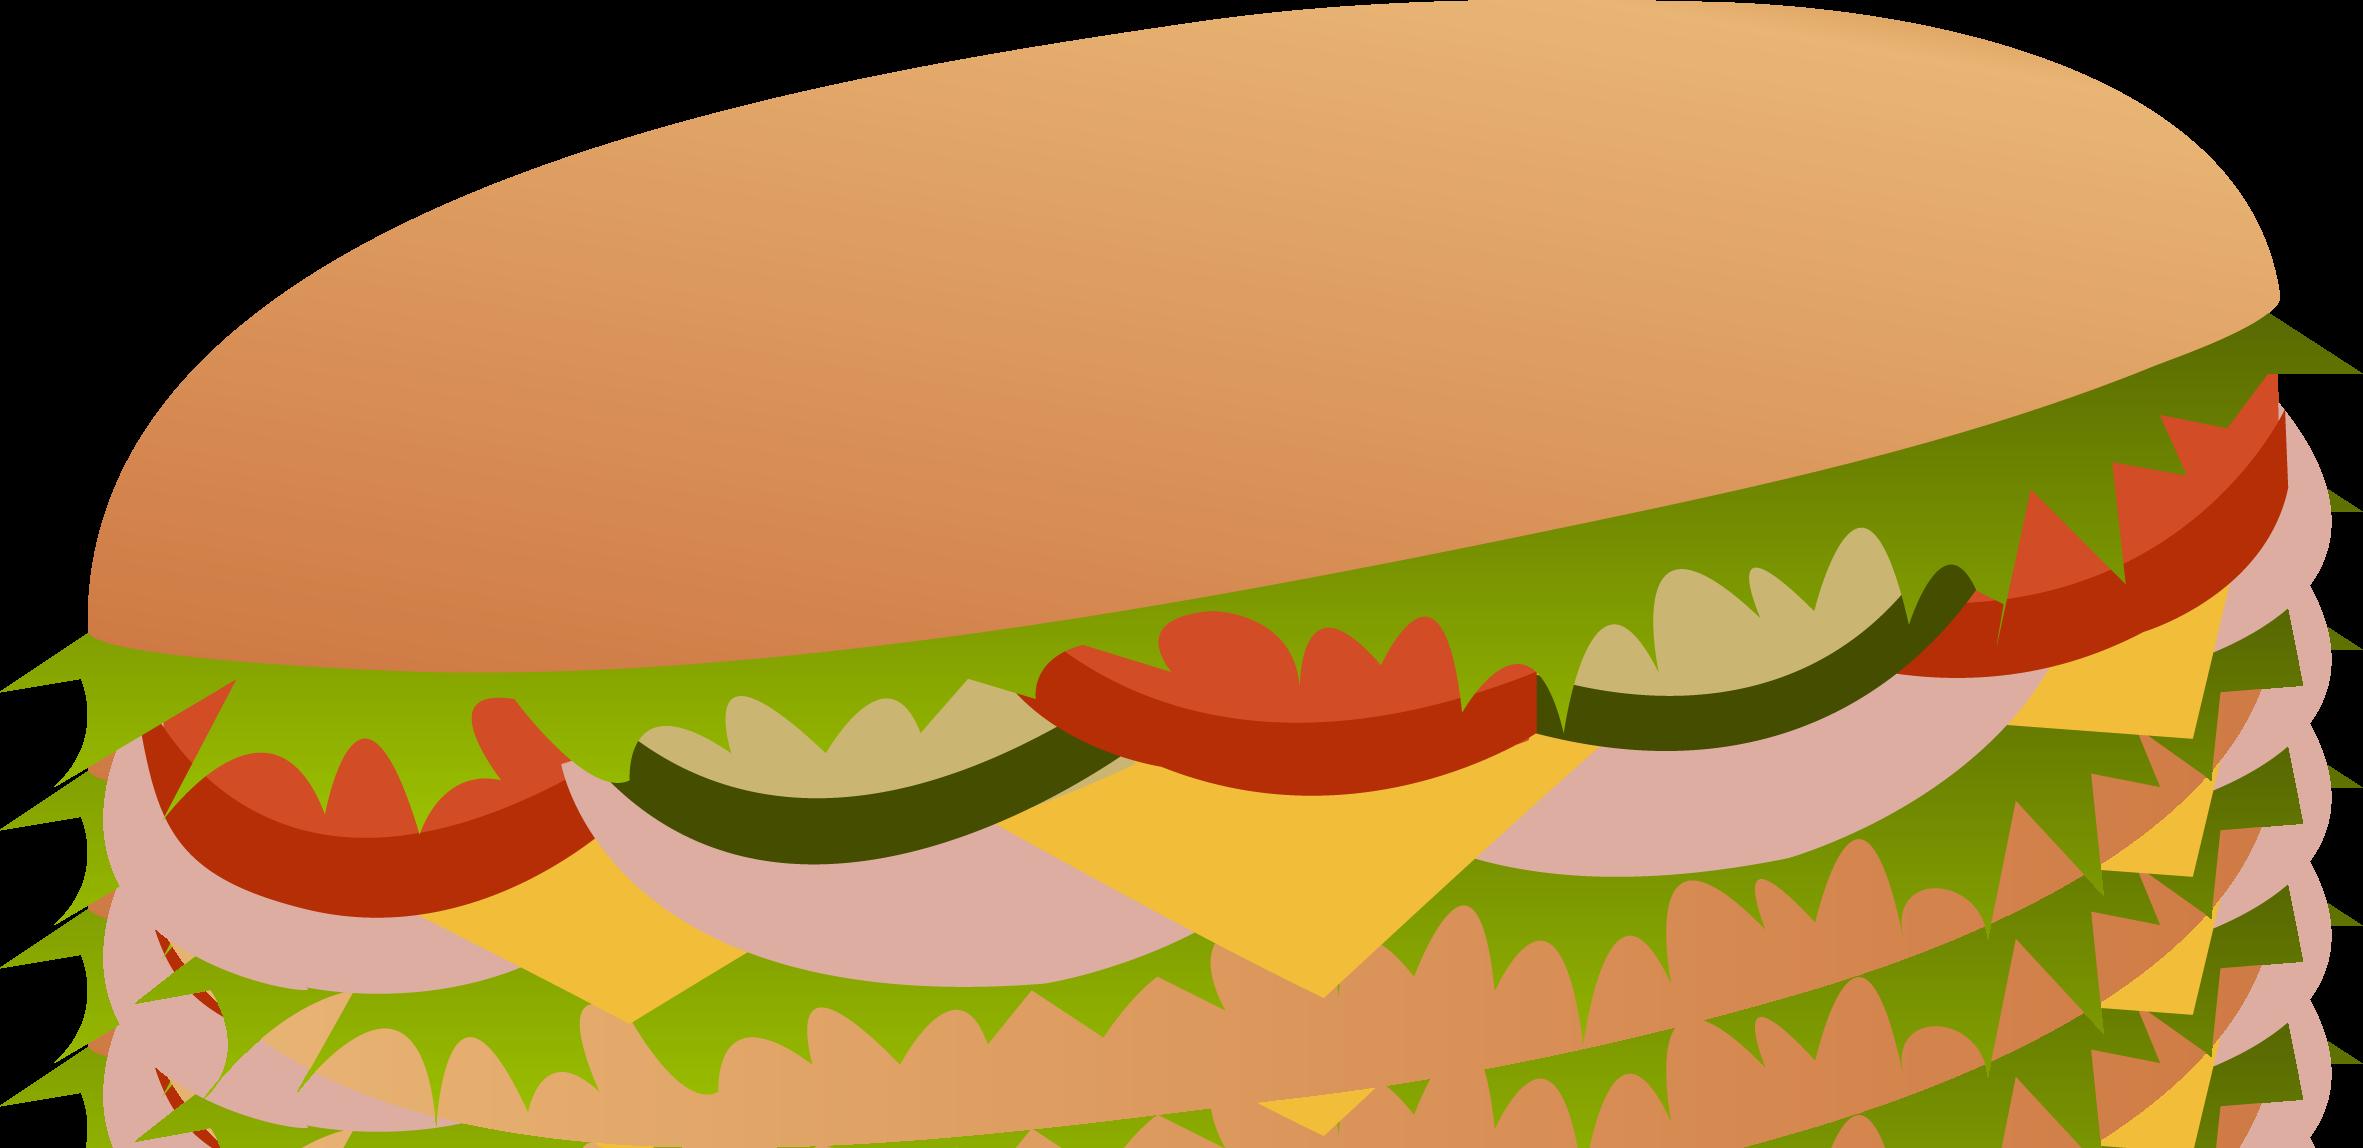 2363x1148 Sub Sandwich Clip Art